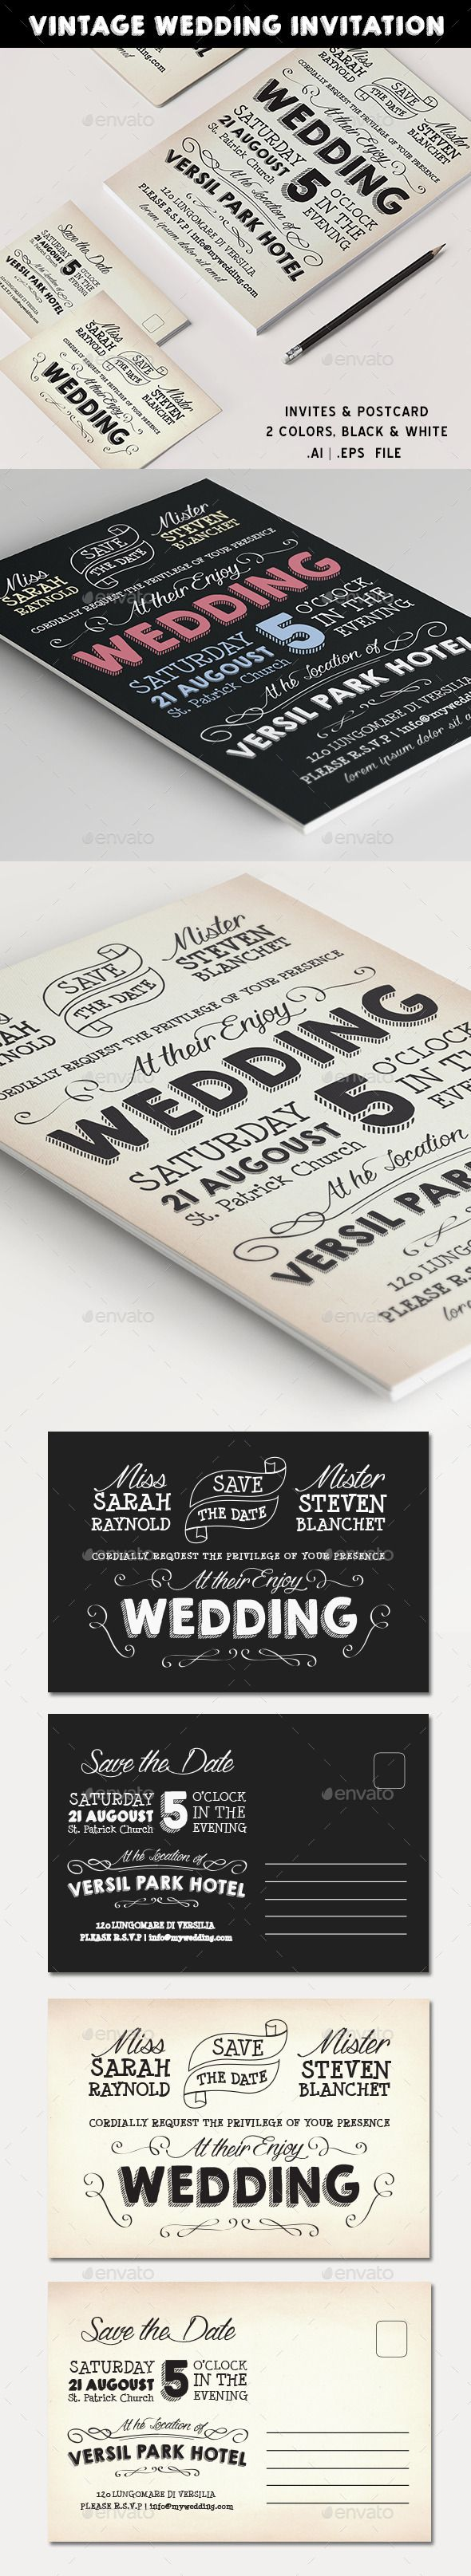 Vintage Wedding Invite — AI Illustrator #retro wedding #retro invite • Available here → https://graphicriver.net/item/vintage-wedding-invite/11439360?ref=pxcr